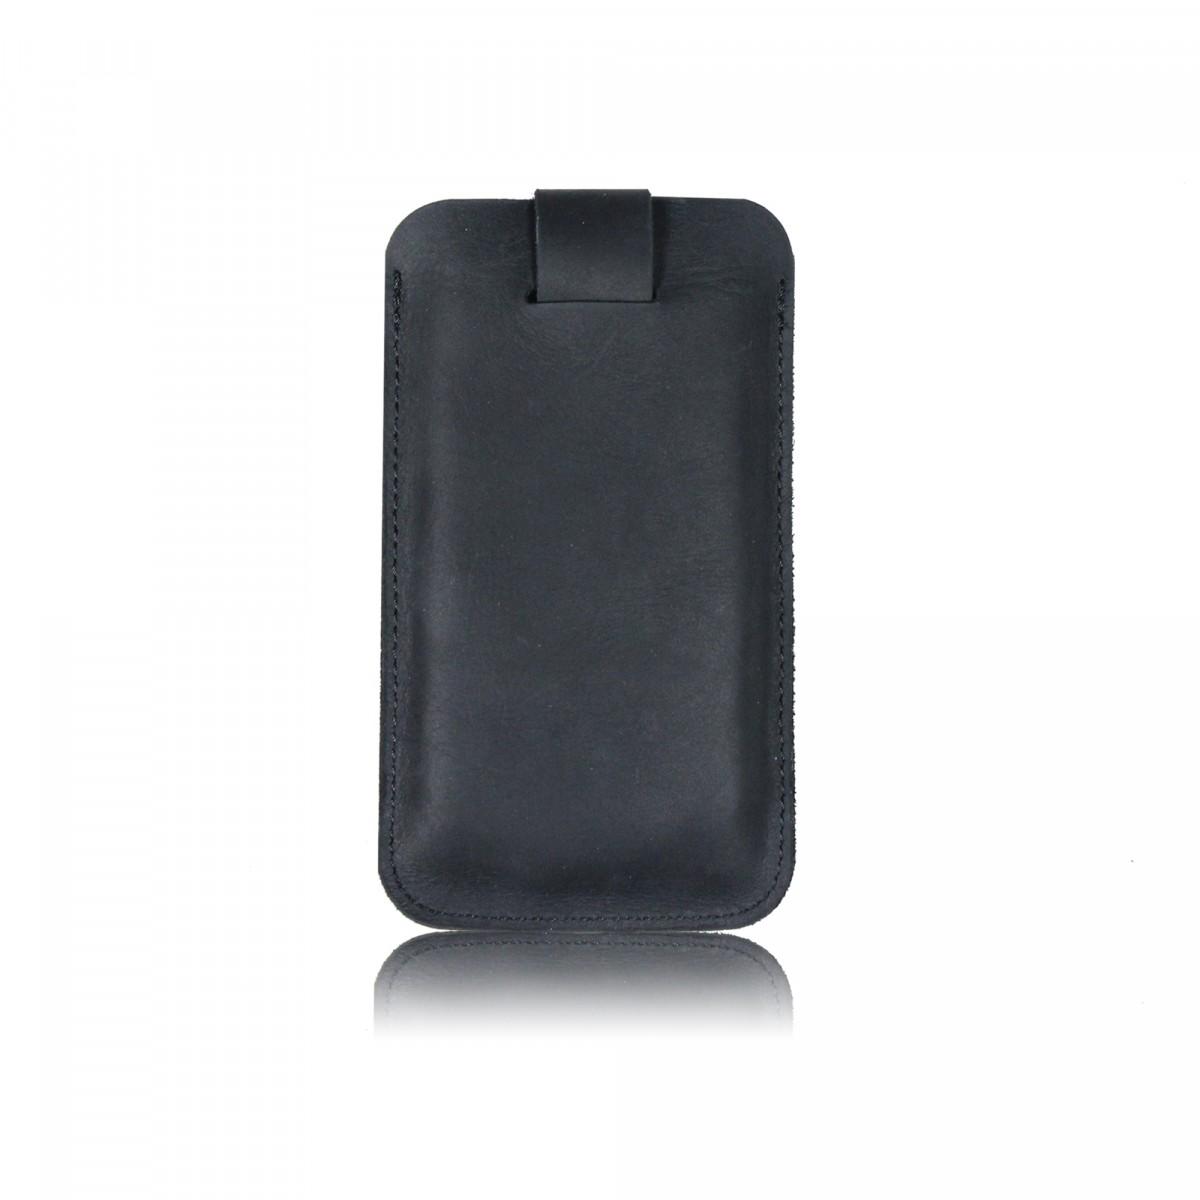 iPhone Case aus schwarzem Leder